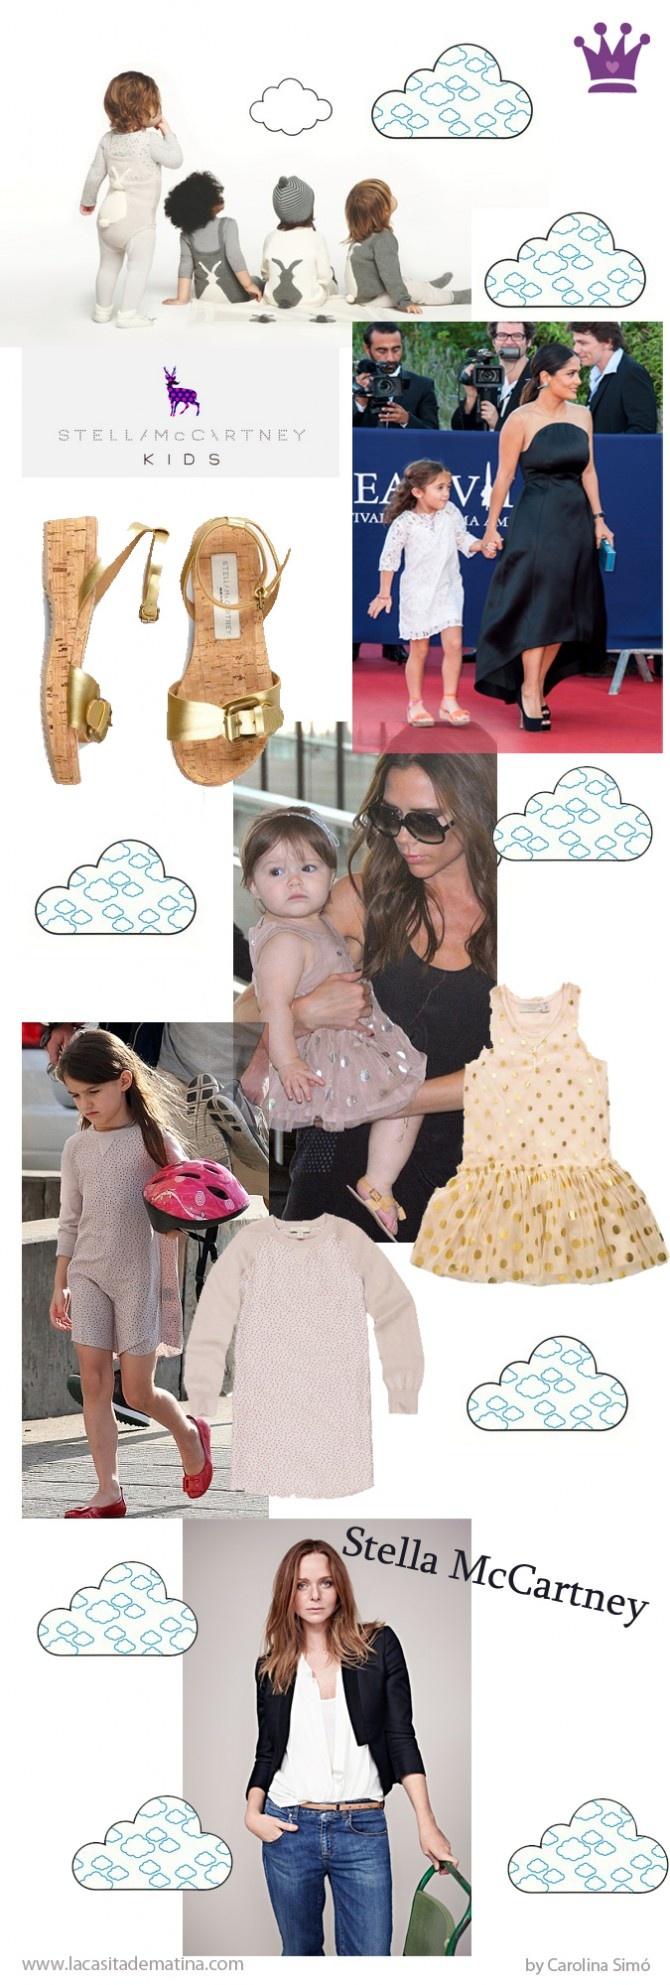 Stella McCartney, www.lacasitademartina.com Kids fashion, Celebrities